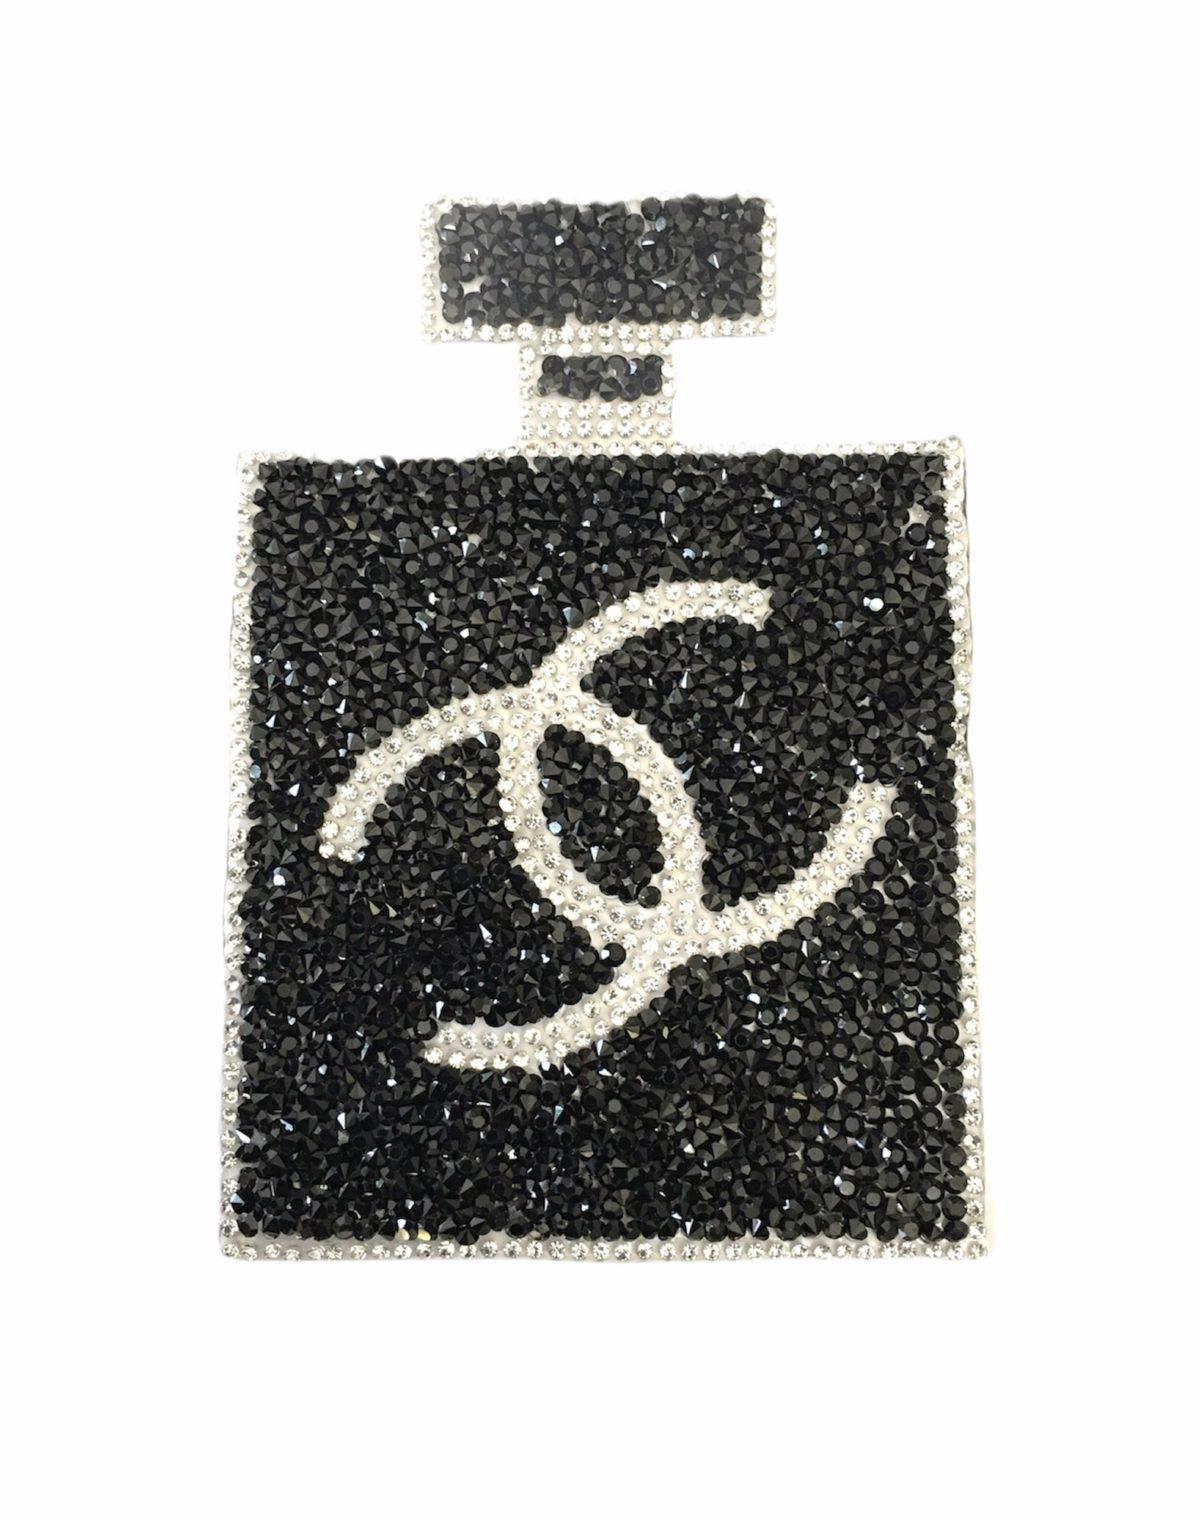 Rhinestone CC Perfume Bottle Patch, Designer Inspired 1